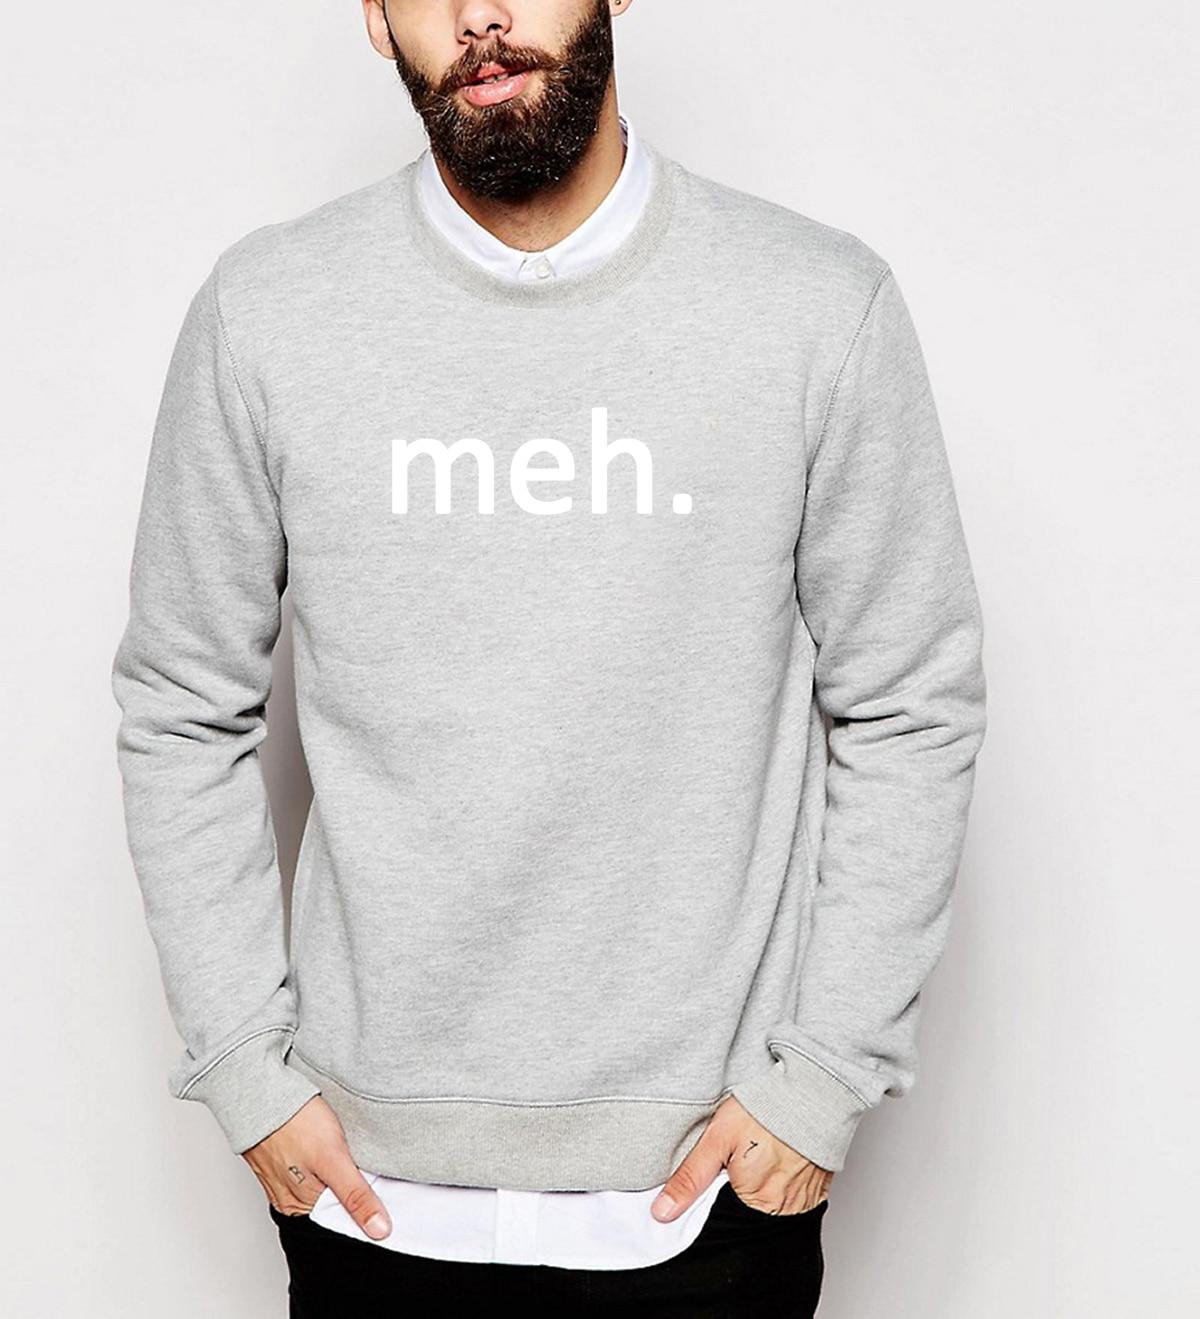 New arrival hip hop harajuku men sweatshirts funny mma Internet male kpop hoodies 2018 fall winter kpop tracksuit brand clothing